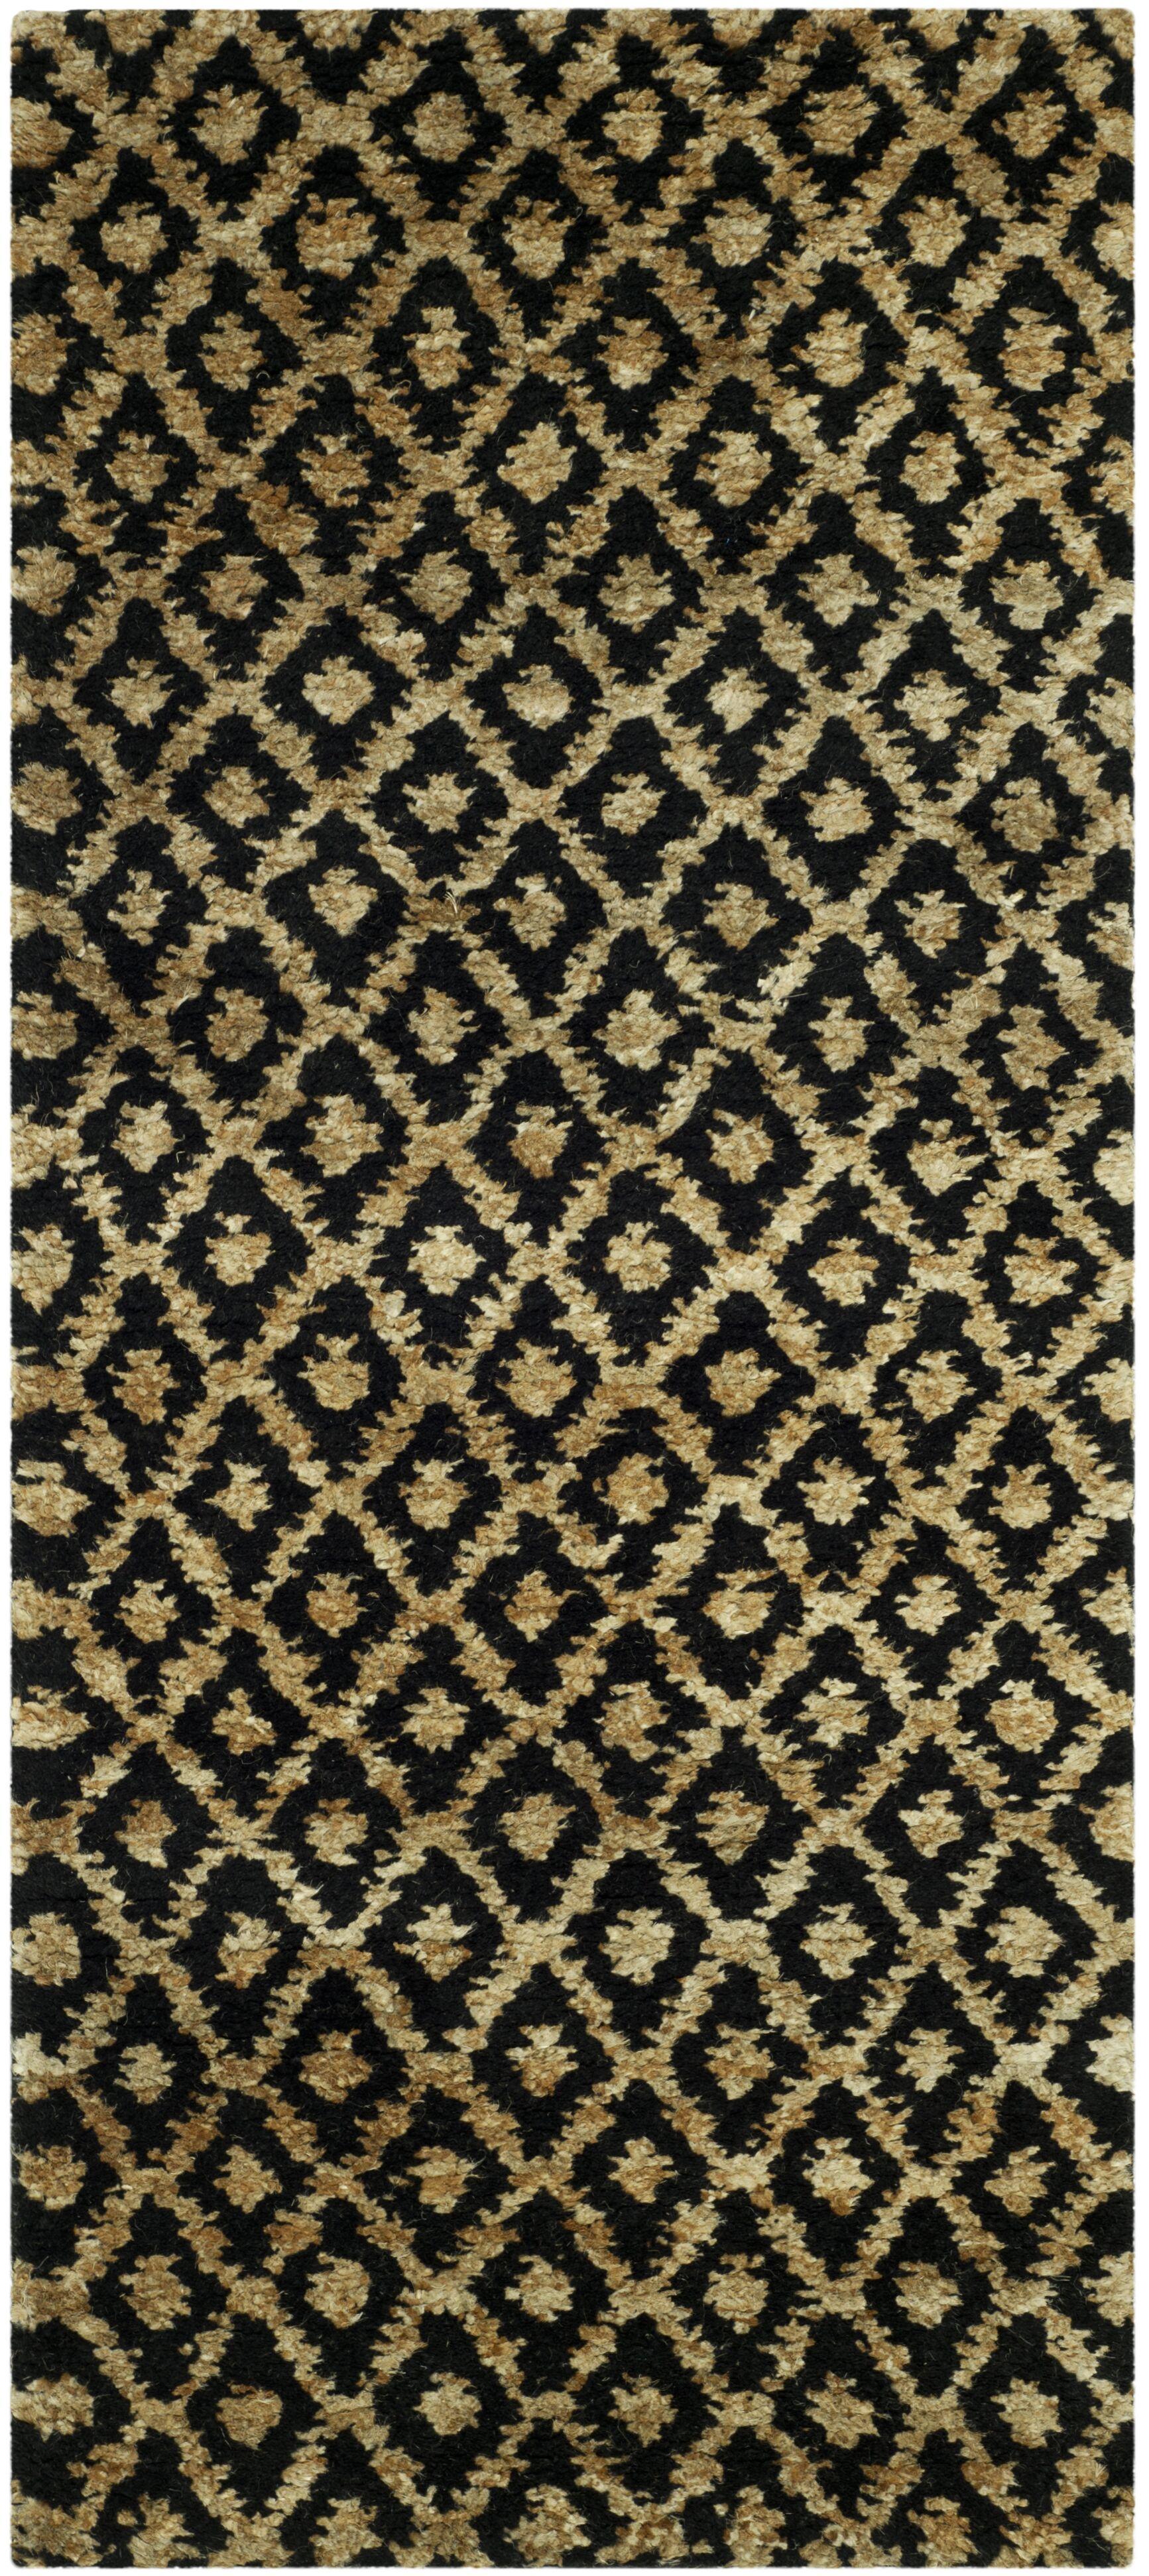 Pinehurst Black/Gold Area Rug Rug Size: Rectangle 5' x 8'